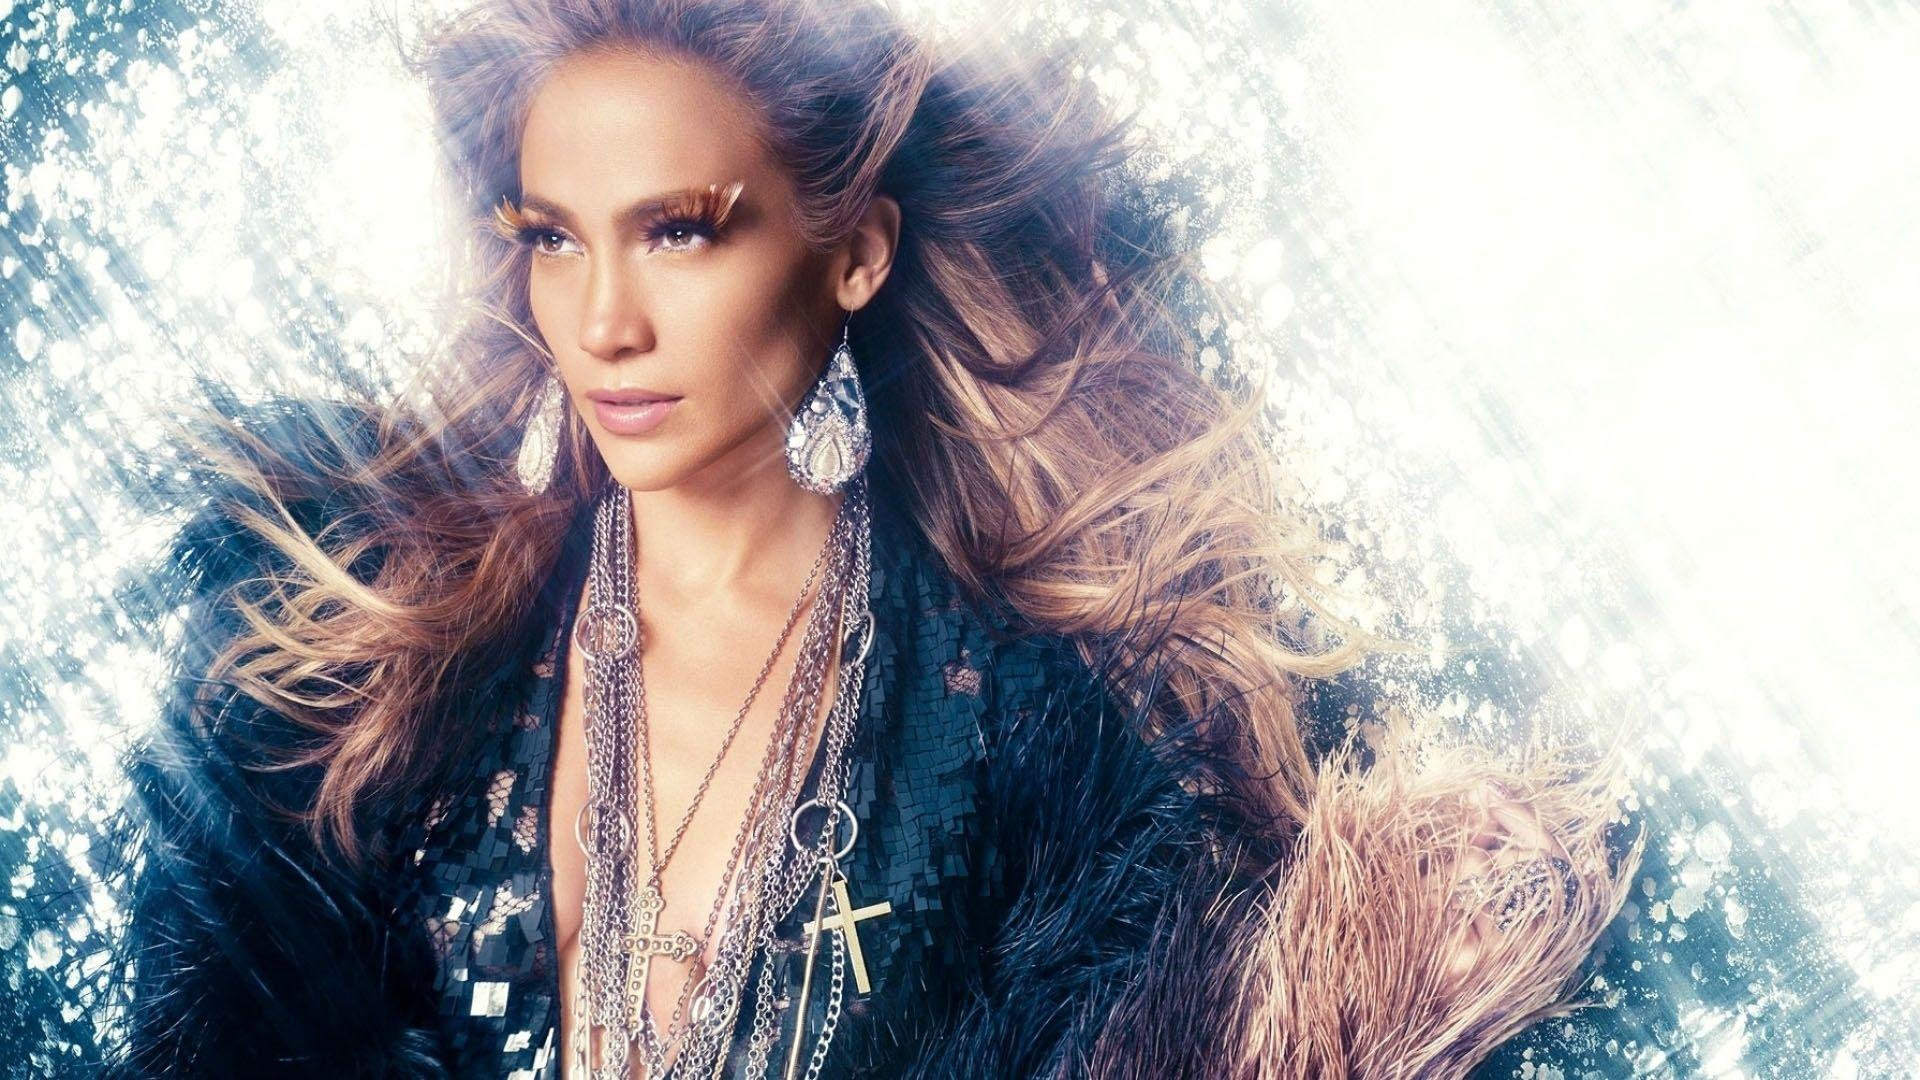 Jennifer Lopez Carried Away Screamed And Danced For U0027American Idolu0027  Contestant   Http://www.movienewsguide.com/jennifer Lopez  Carried Away Screamedu2026